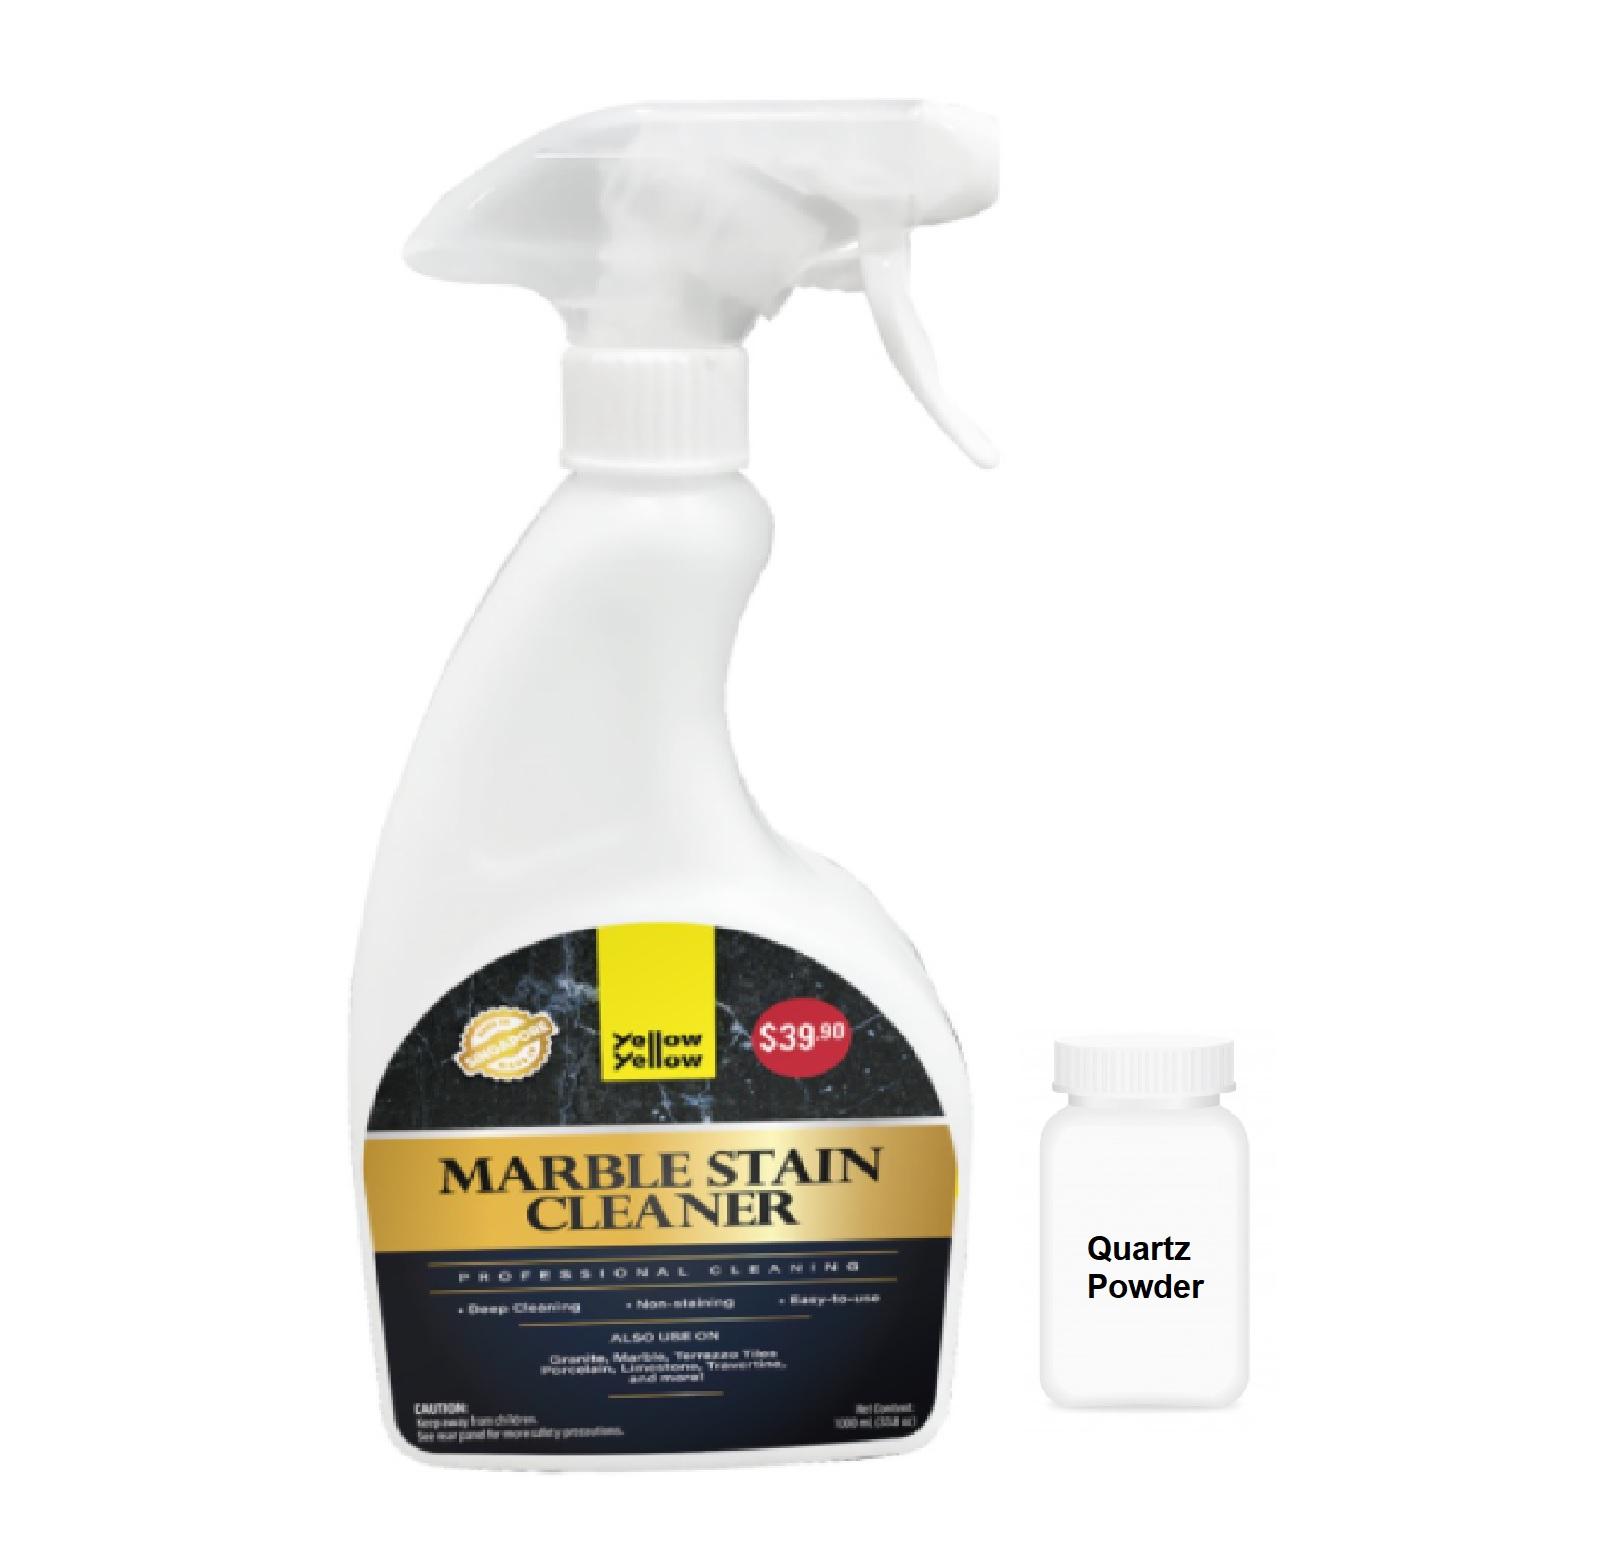 Yellowyellow Heavy Duty Marble Cleaner With Quartz Powder 1L